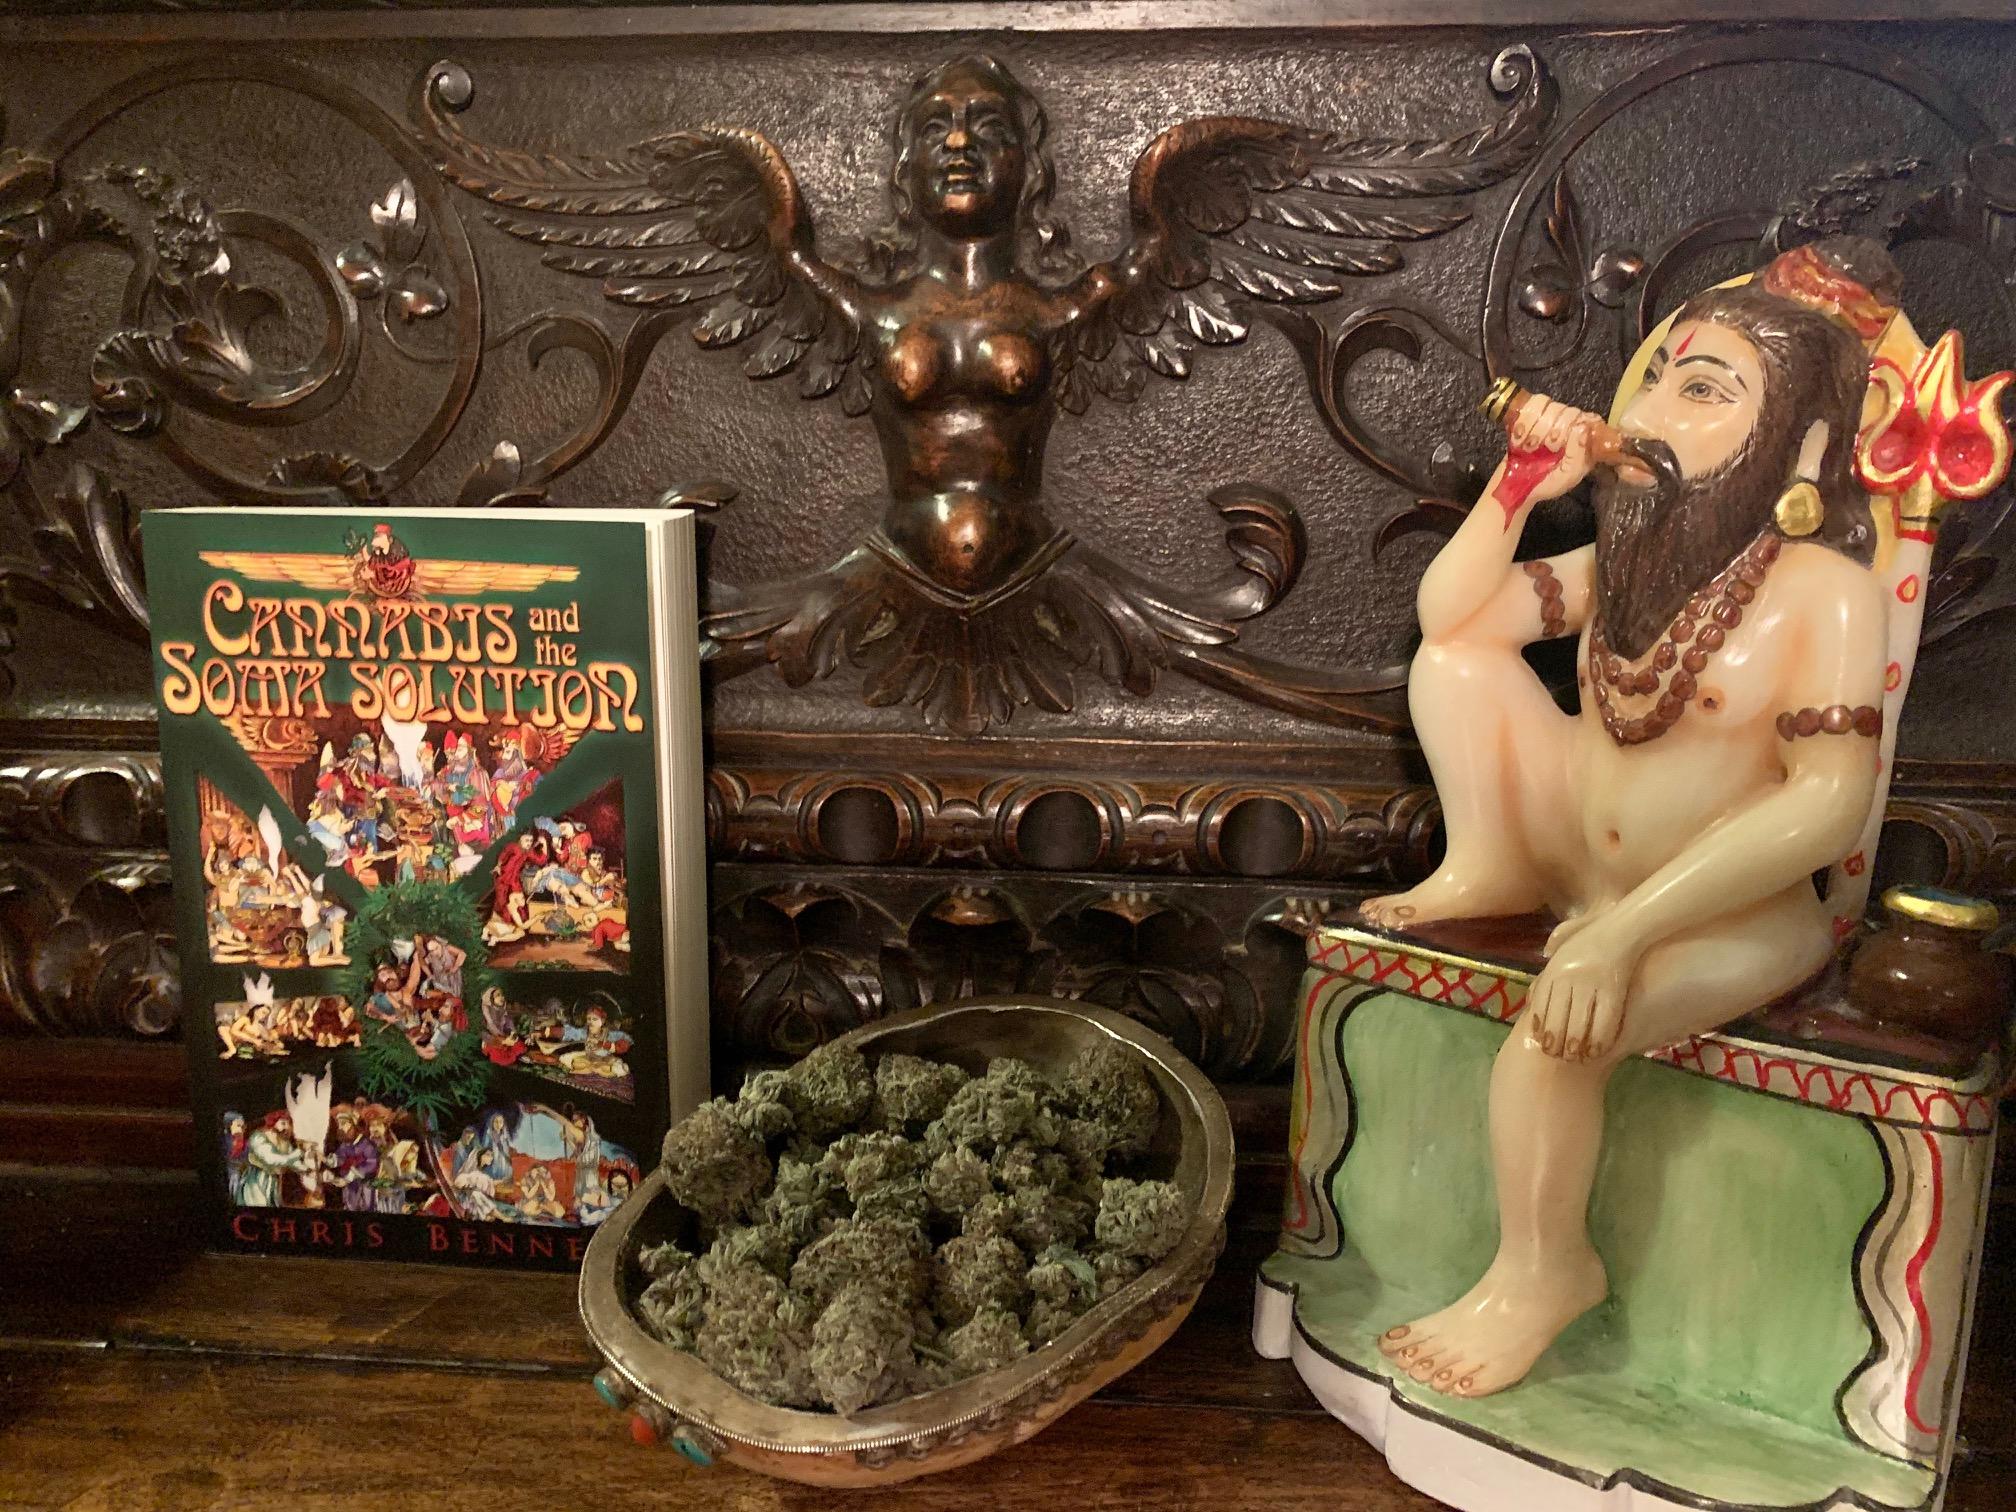 Aphrodisiac The Sexual Secret Of Marijuana 1971 the cannabis soma/haoma theory: a synopsis based on the